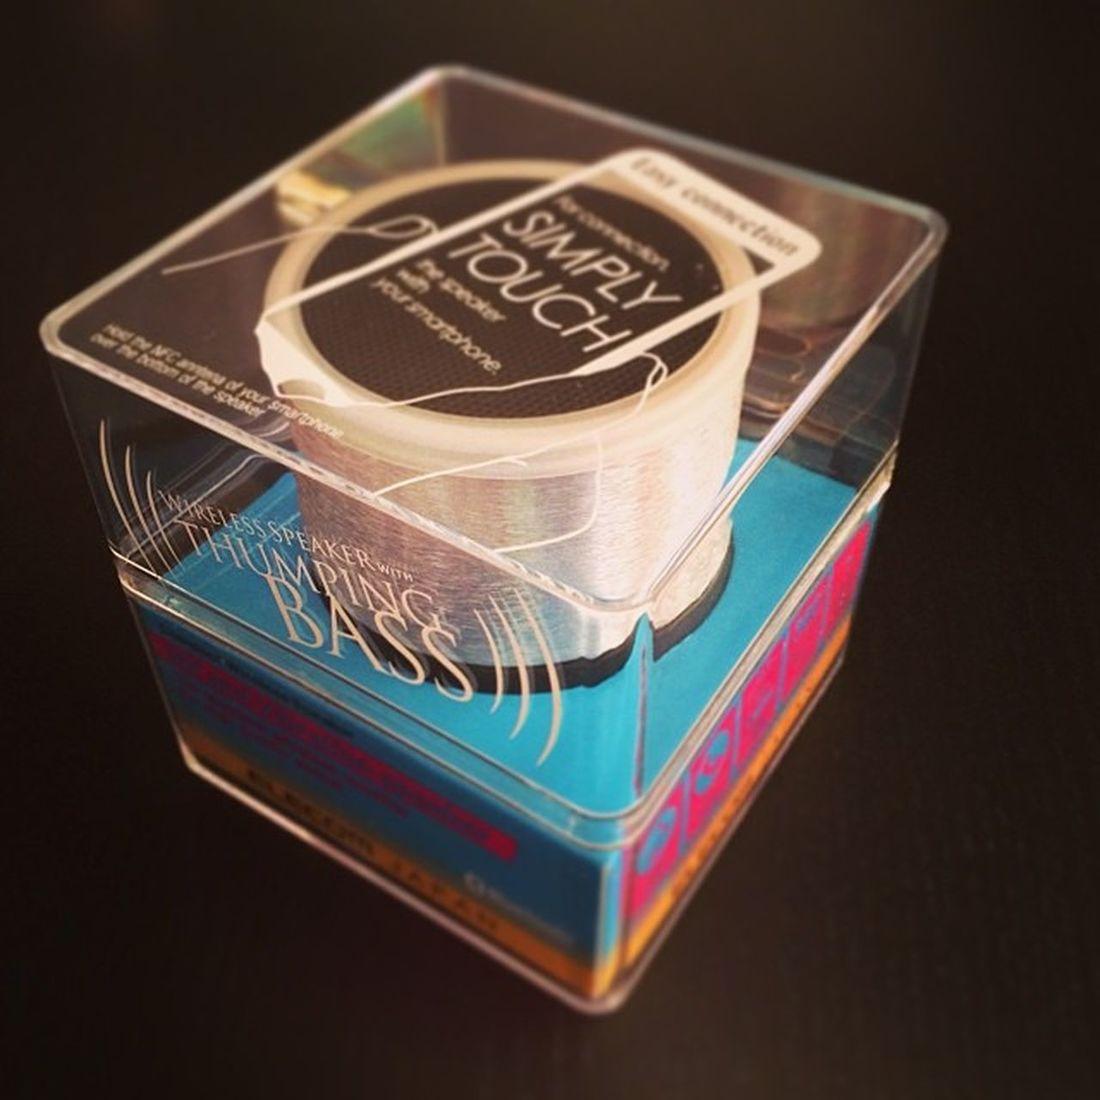 Neues, cooles #NFC fähiges #Bluetooth #Streaming Gadget aus dem Hause ELECOMeurope #Musik #Podcast #Telefonieren Musik Bluetooth Streaming Podcast Nfc Telefonieren